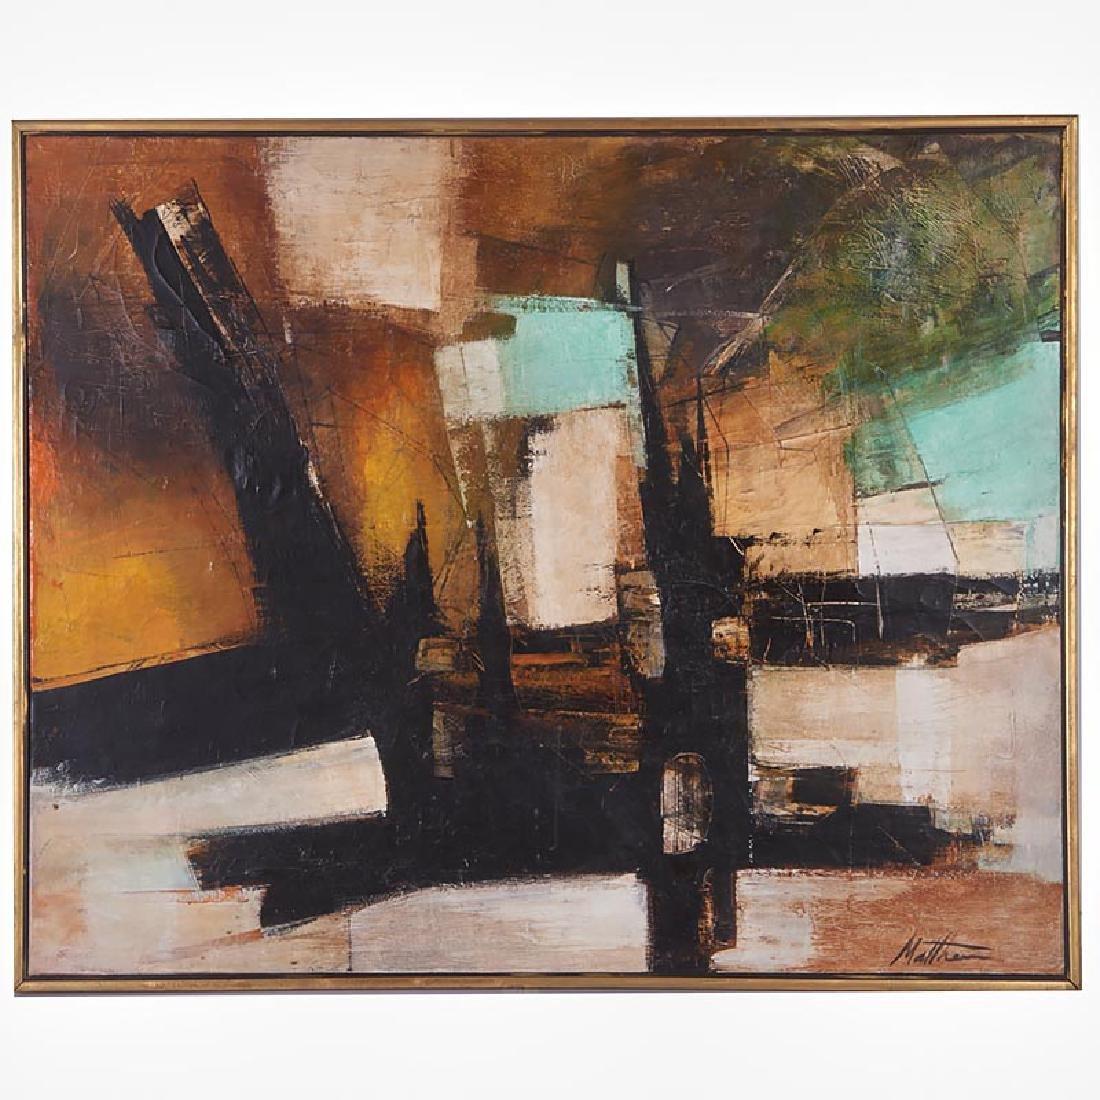 Matthew D. Carone, painting